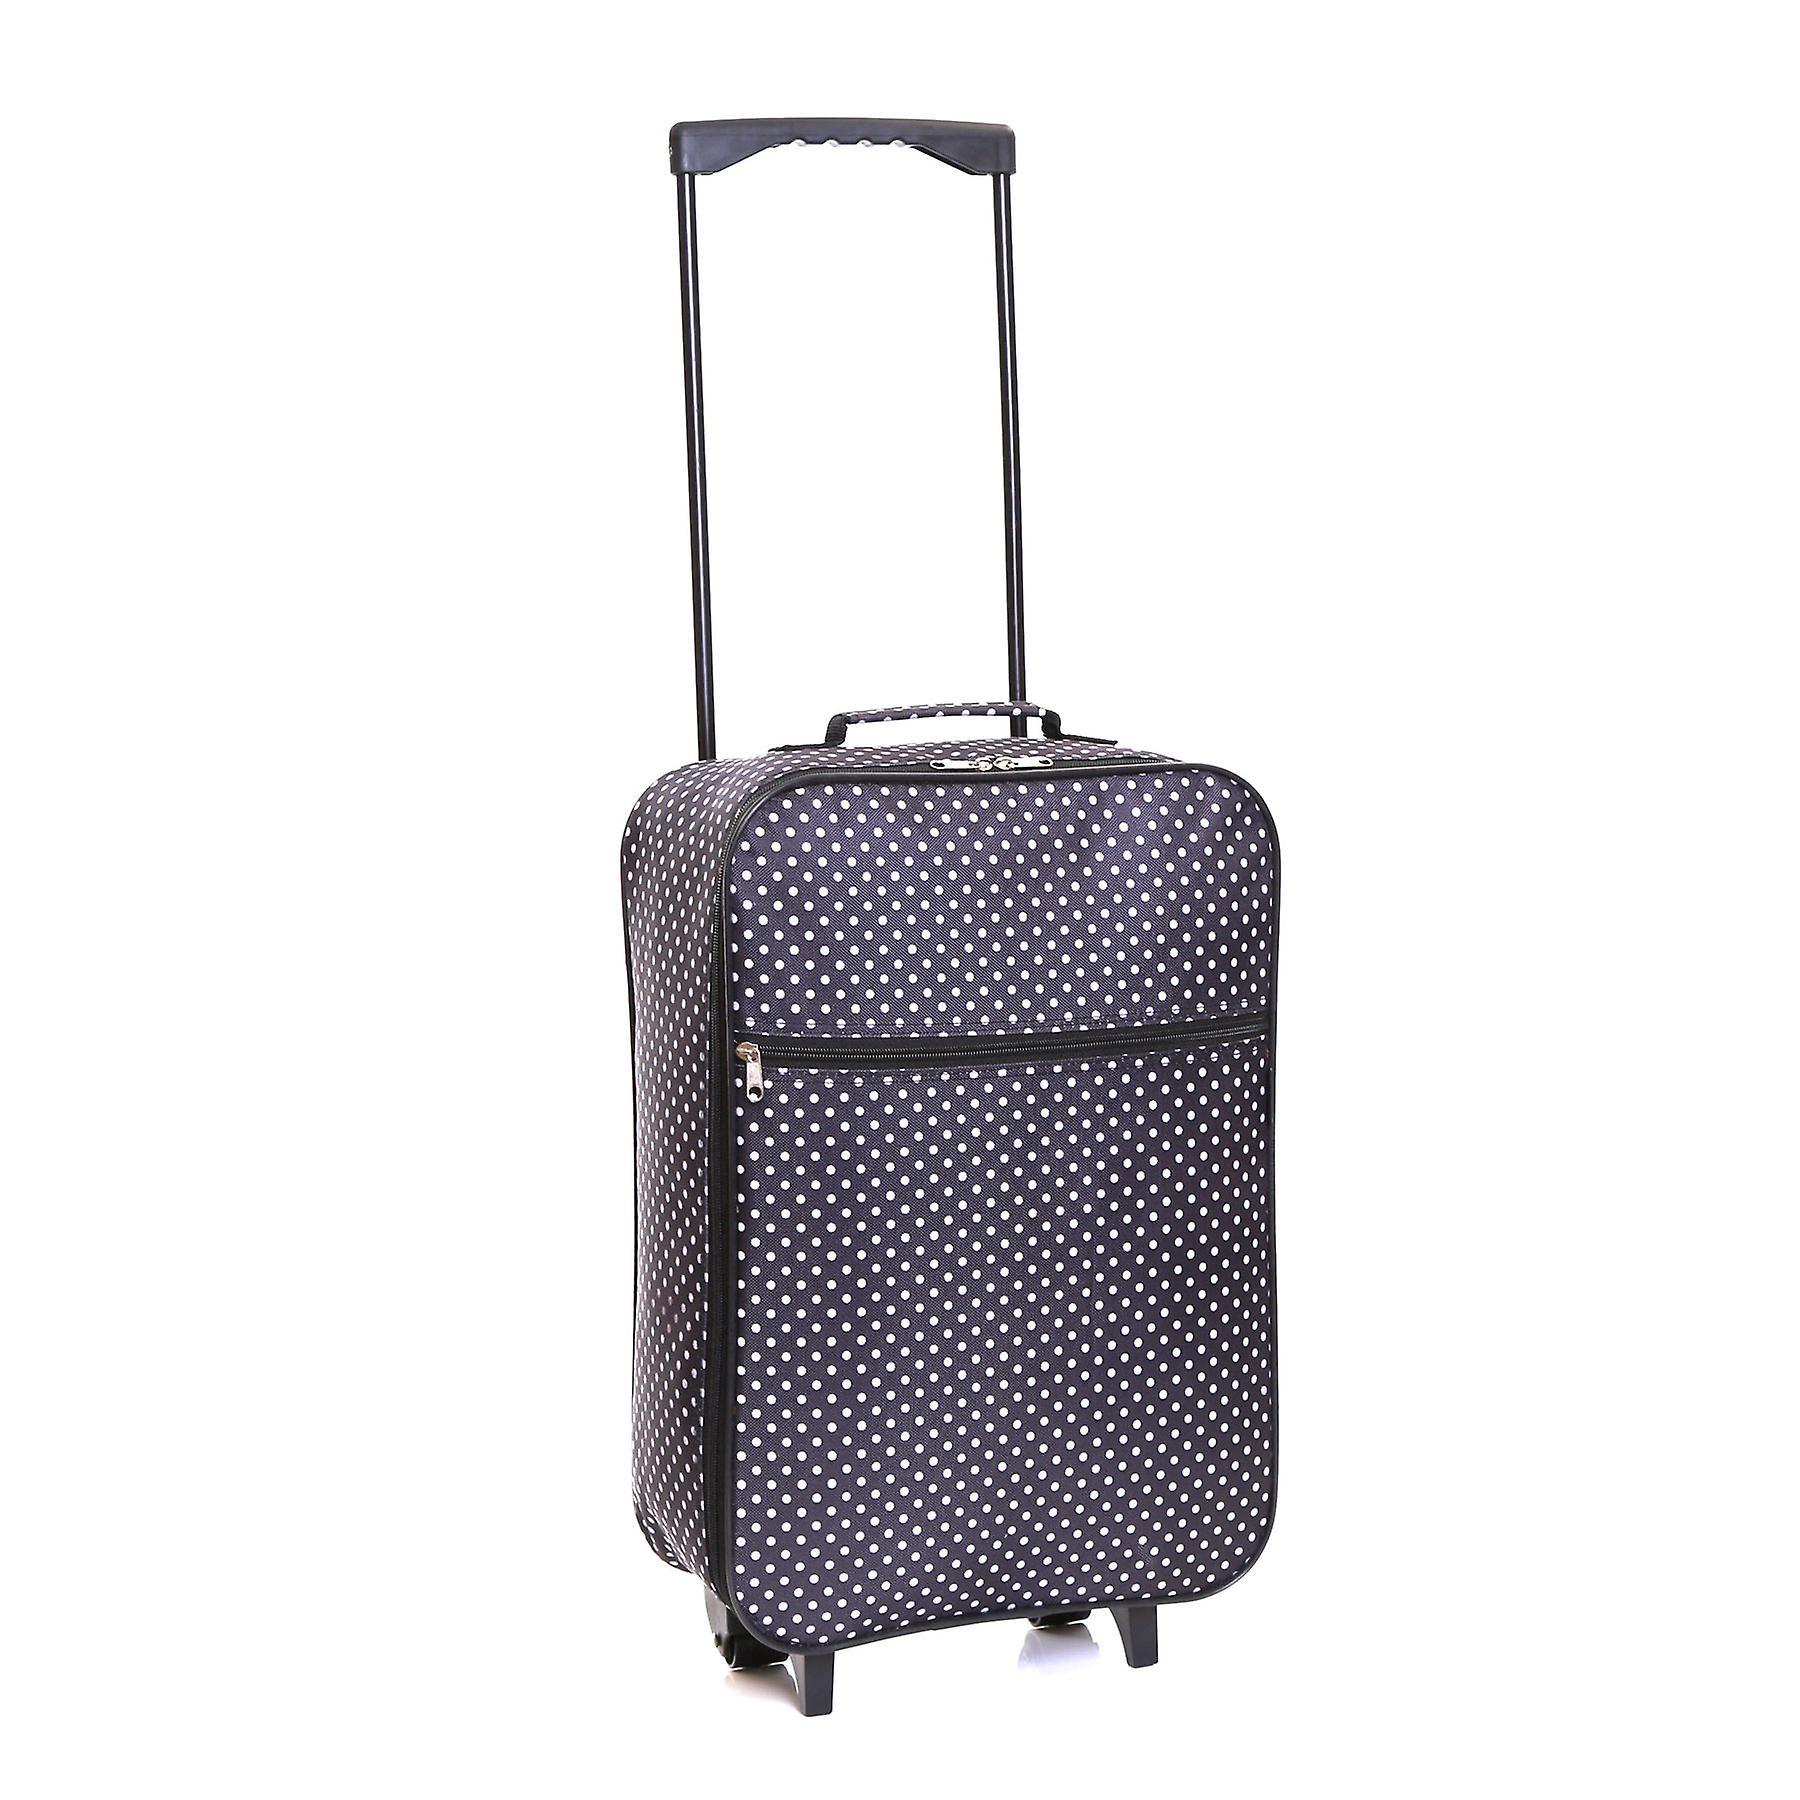 Slimbridge Barcelona Cabin Approved Bag, Black Dots